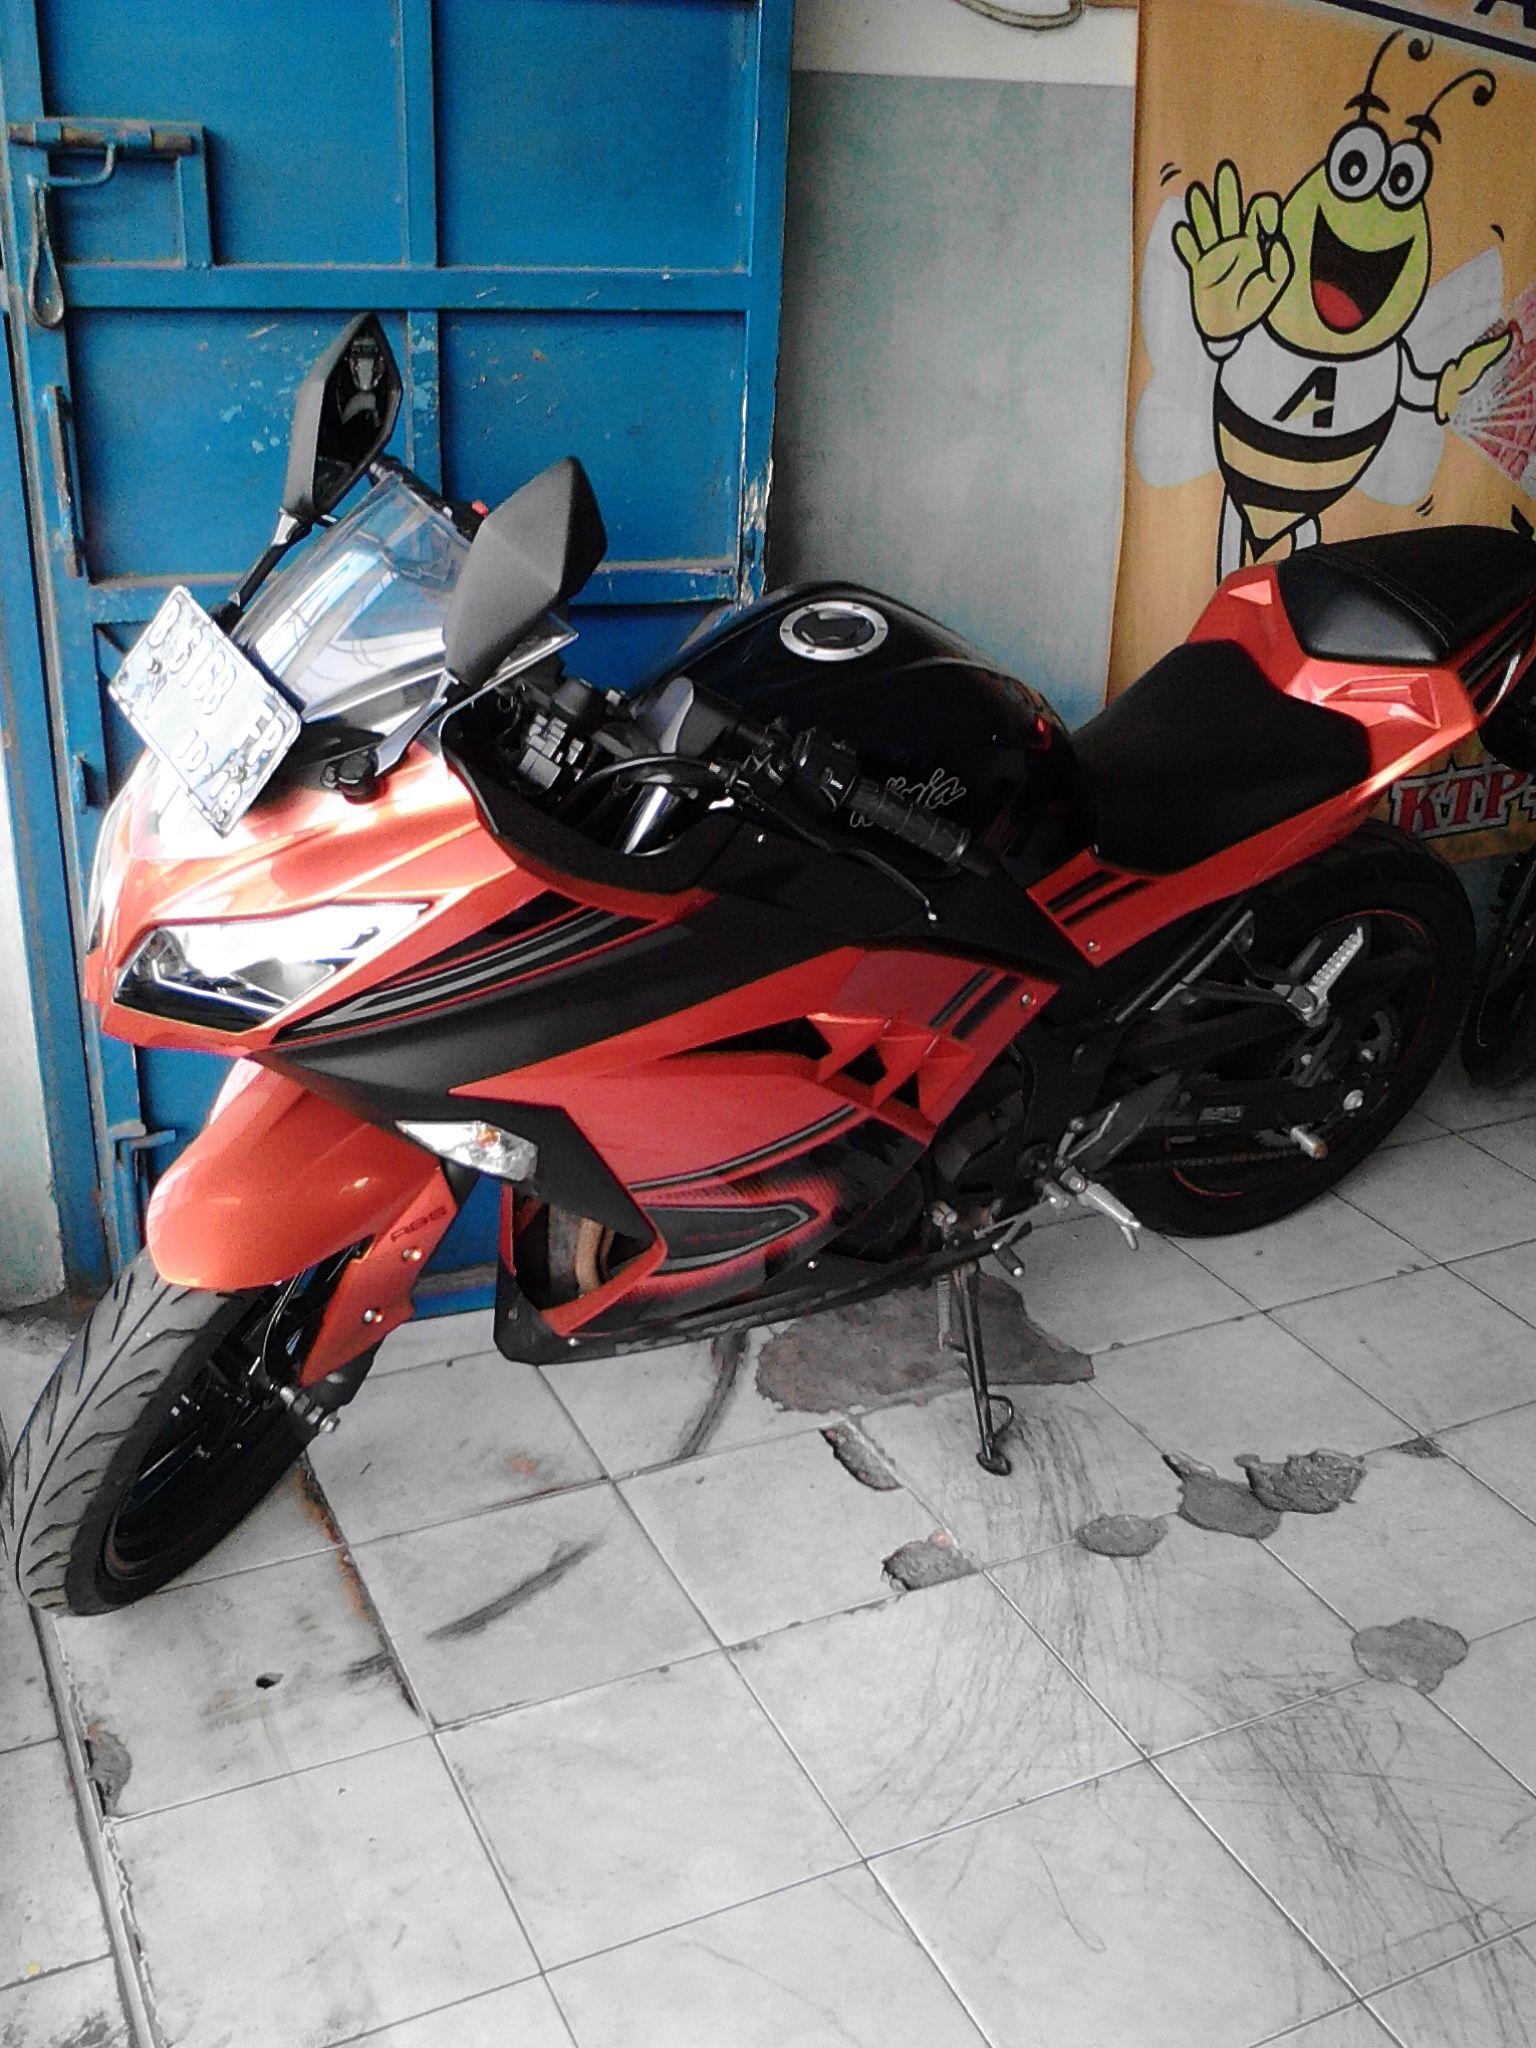 Kredit Murah Motor Bekas Kawasaki Ninja 250 Abs Se Orange 2013